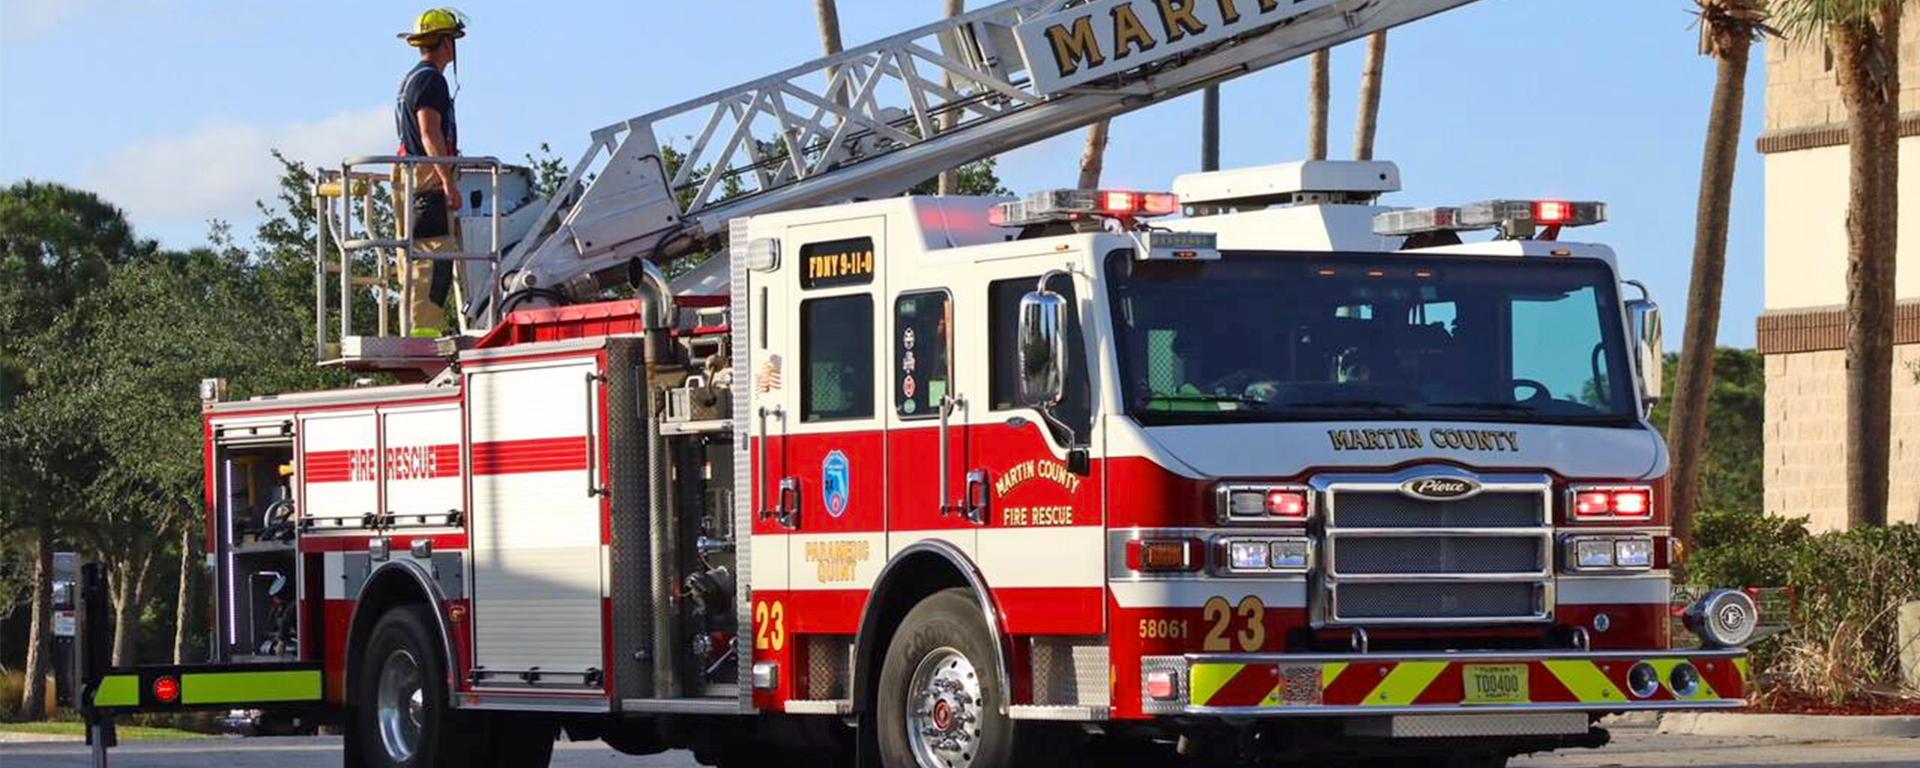 A Martin County Fire Truck